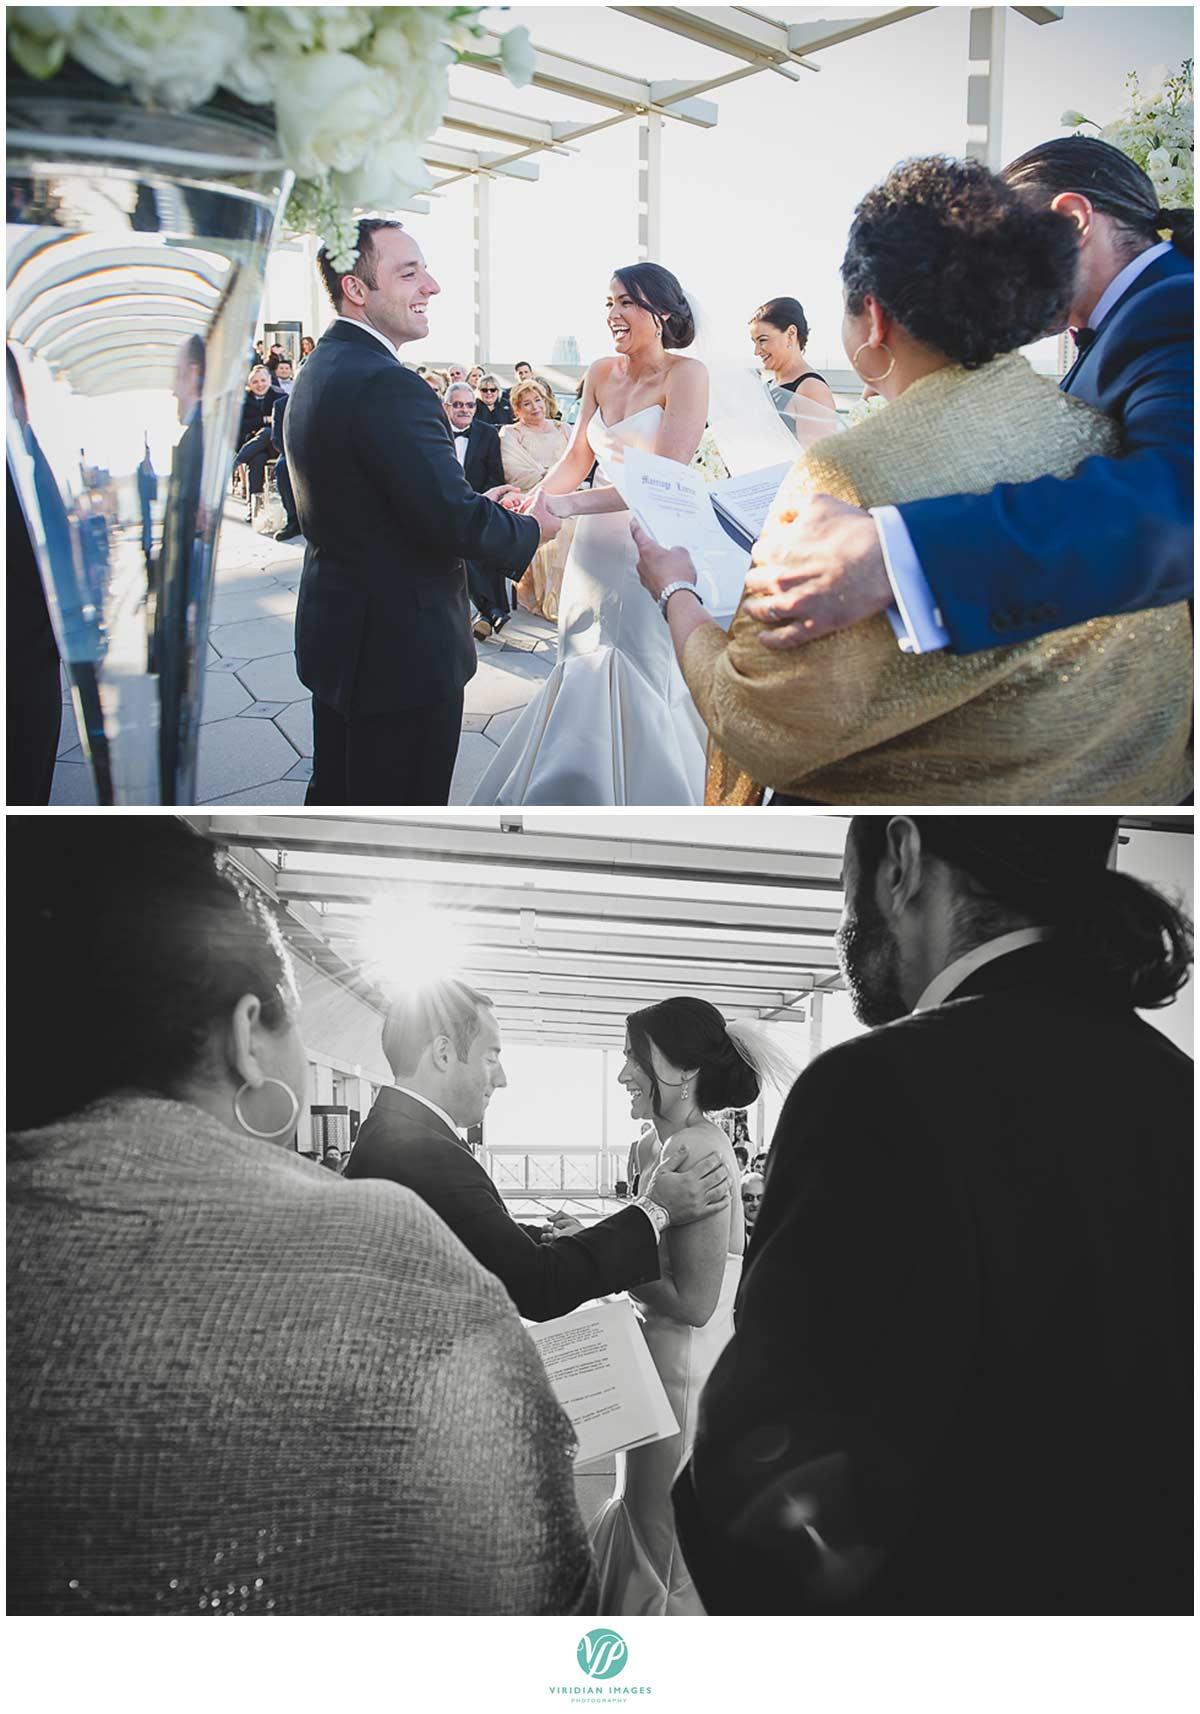 Peachtree_Club_Atlanta_Wedding_Viridian_Images_Photography-26